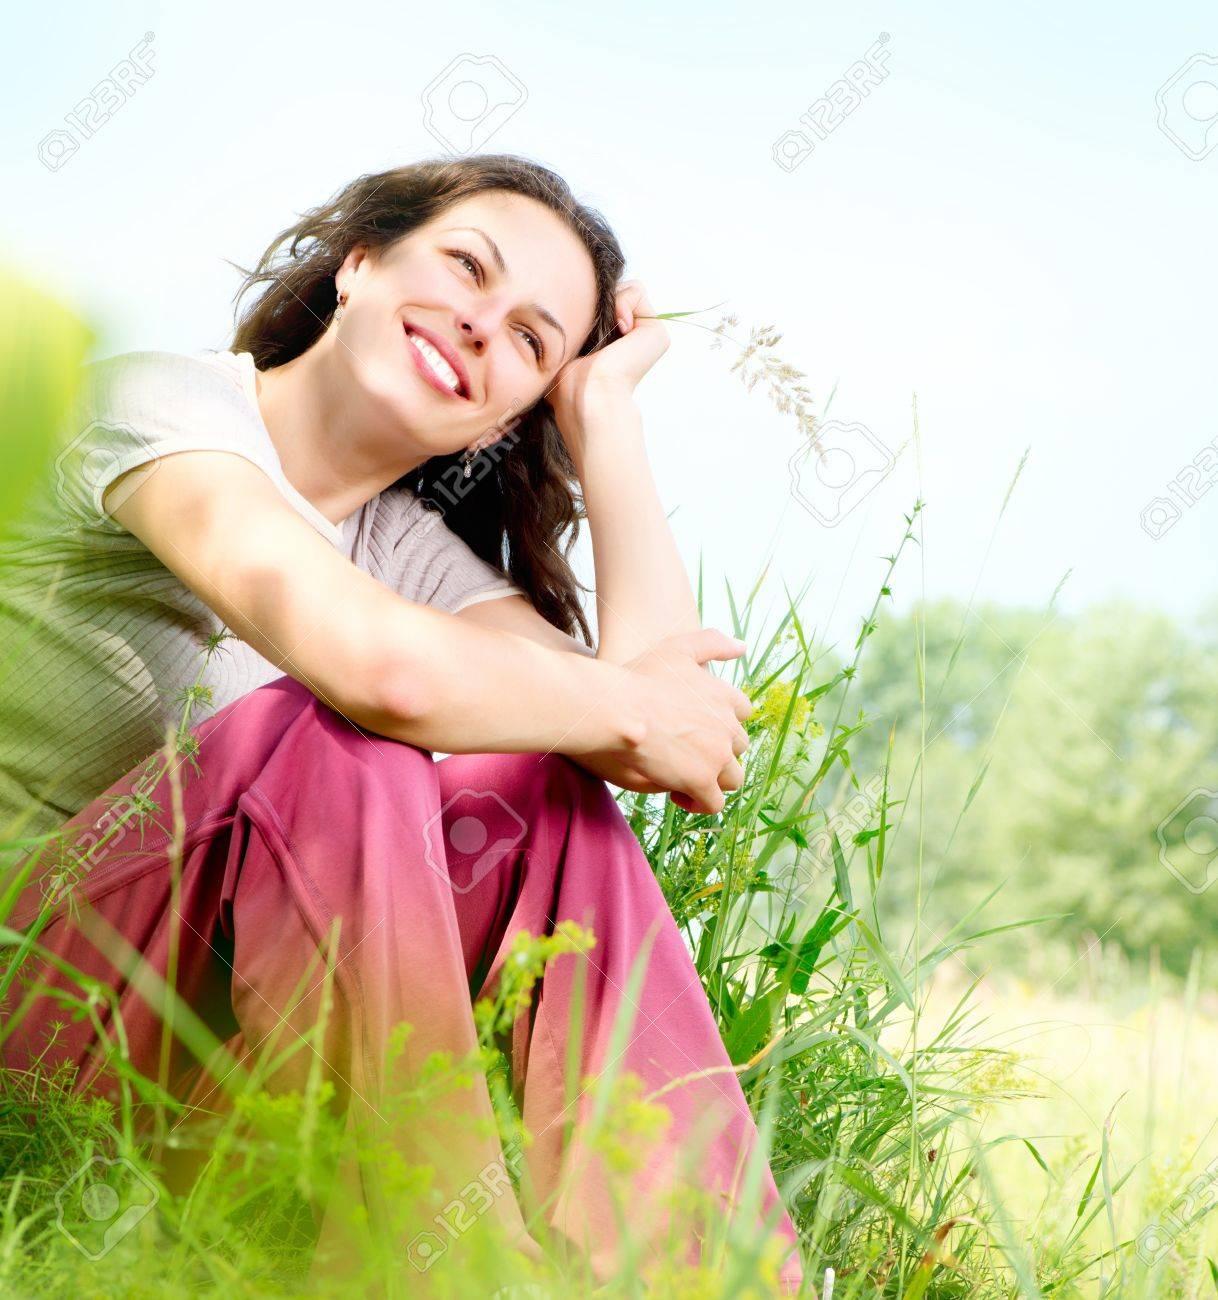 Beautiful Young Woman Outdoors  Enjoy Nature  Meadow Stock Photo - 18690602